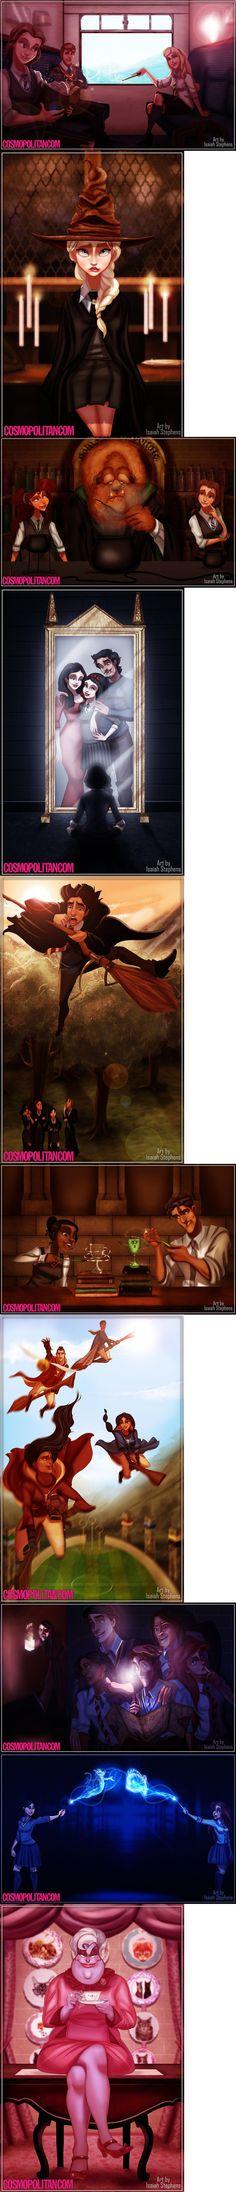 If Disney Princesses Went To Hogwarts